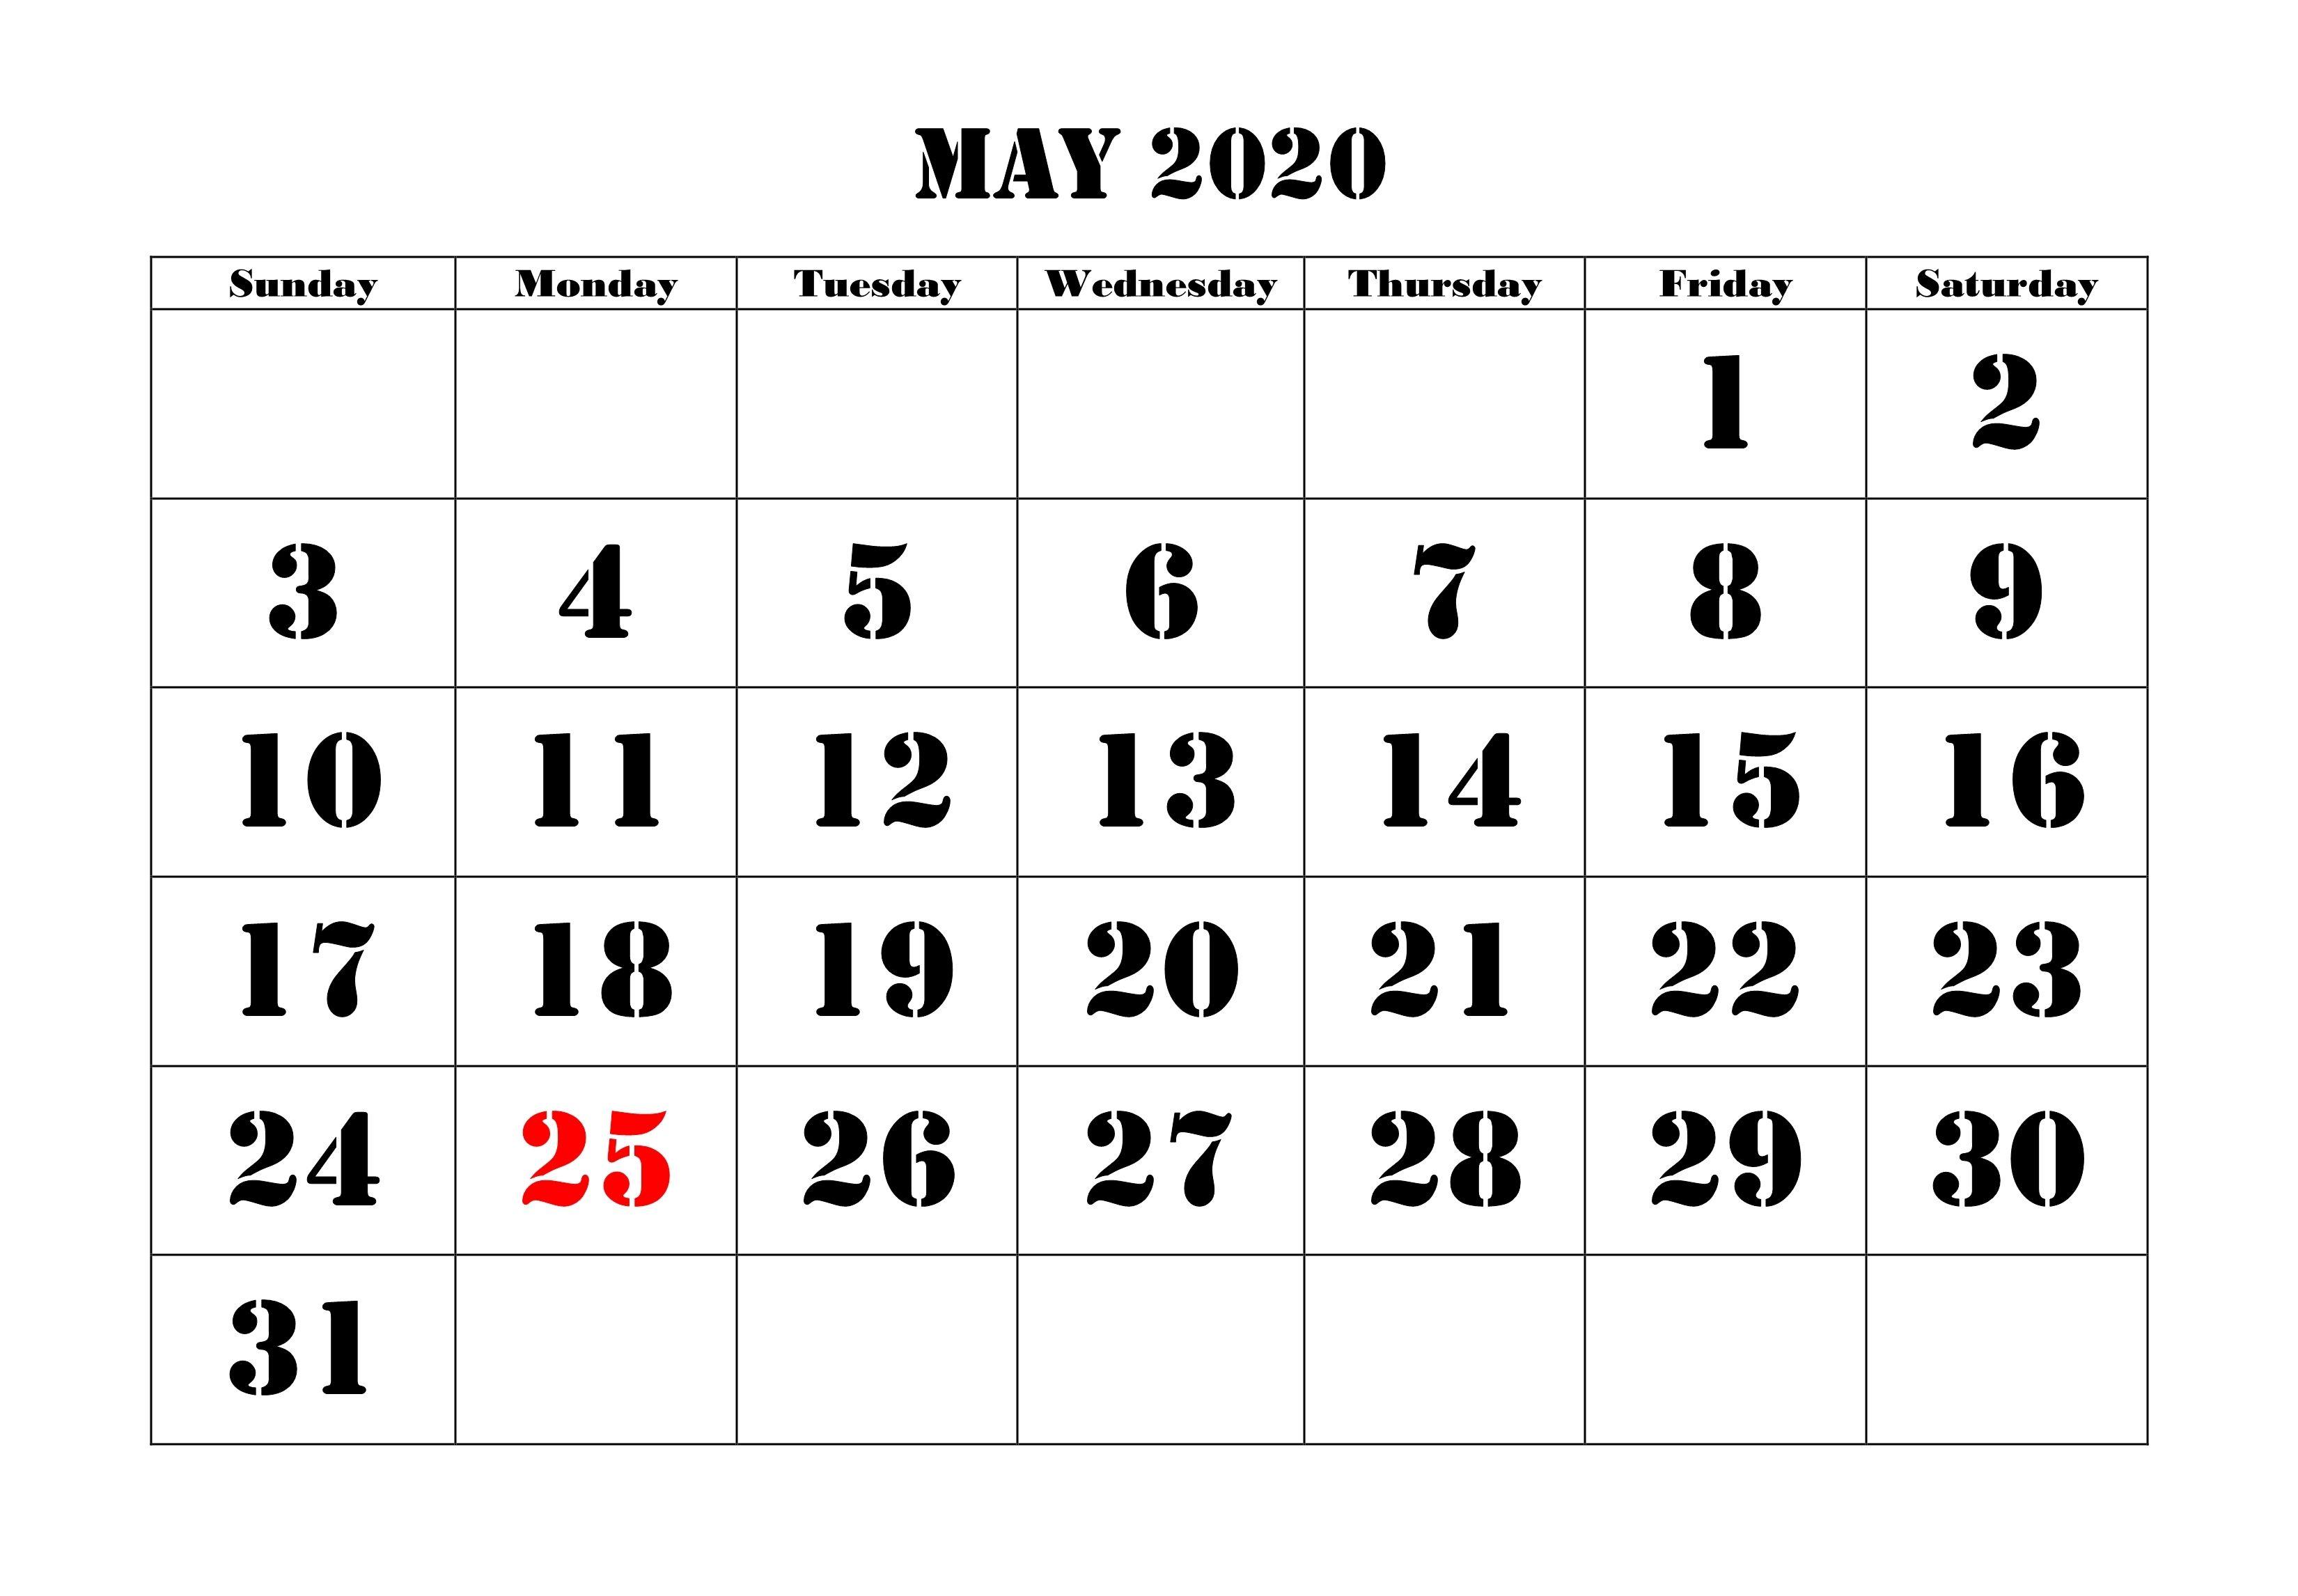 May 2020 Calendar Printable | Calendar, Calendar Pages